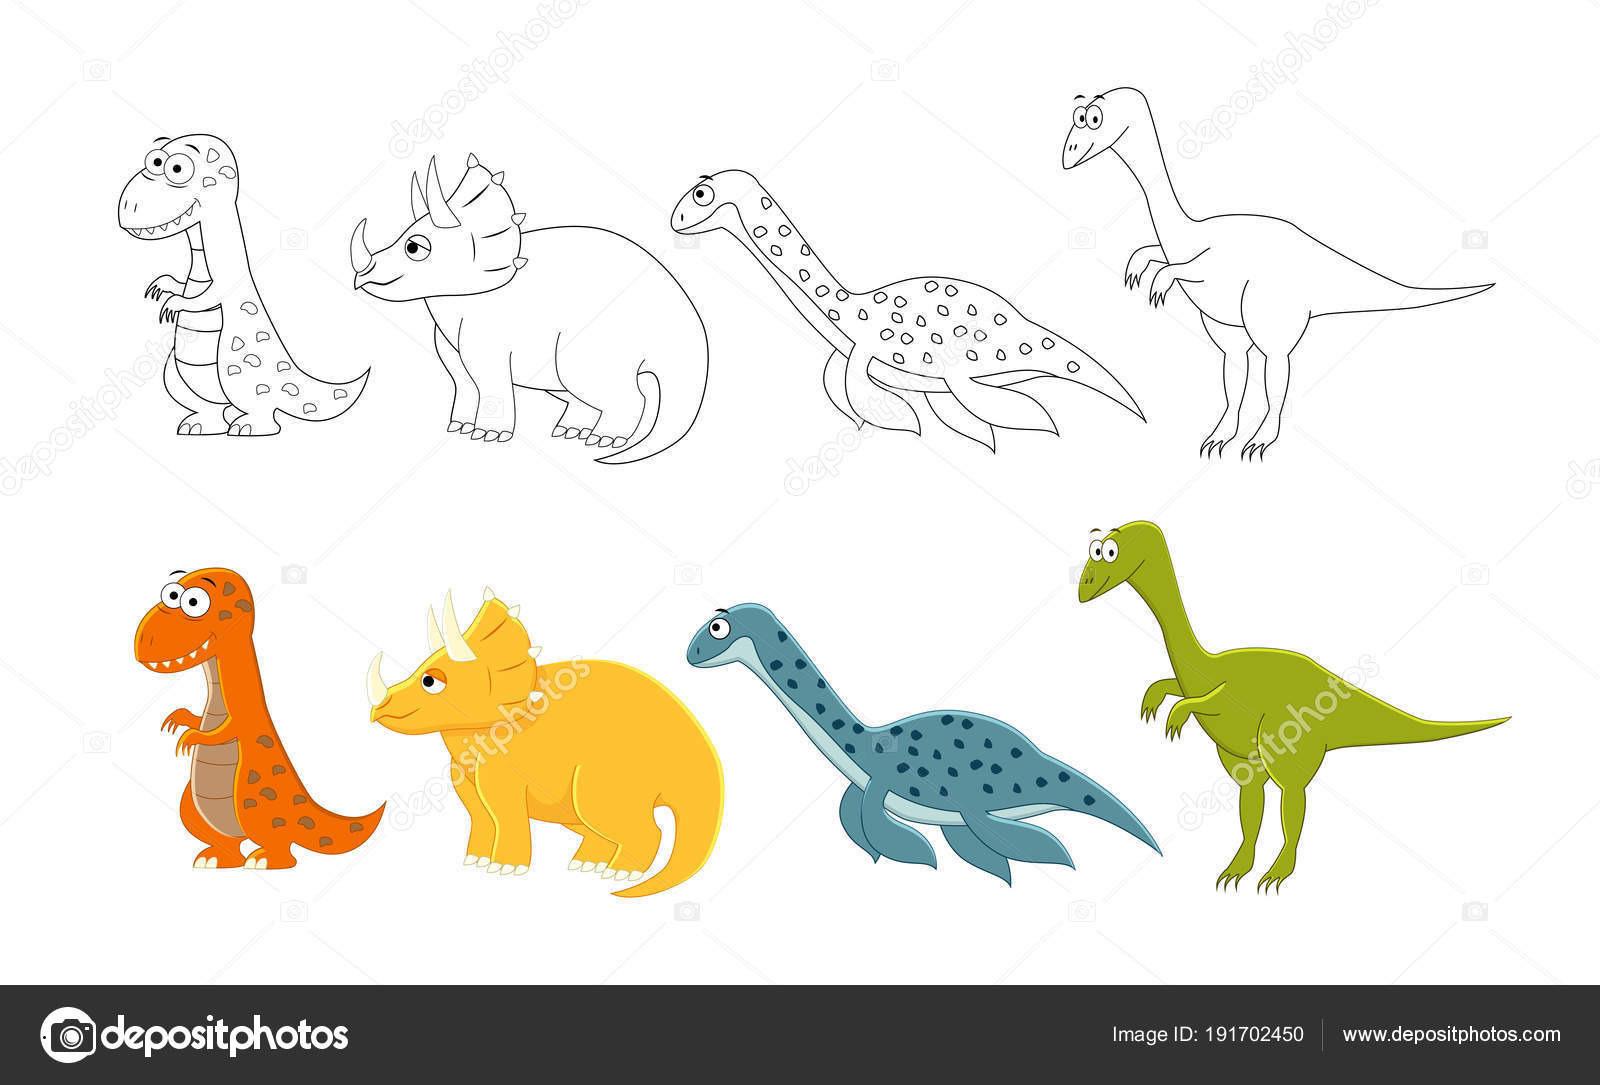 Ausmalbilder Dinosaurier Rex Neu 44 Idee Ausmalbilder Tyrannosaurus Rex Treehouse Nyc Fotos